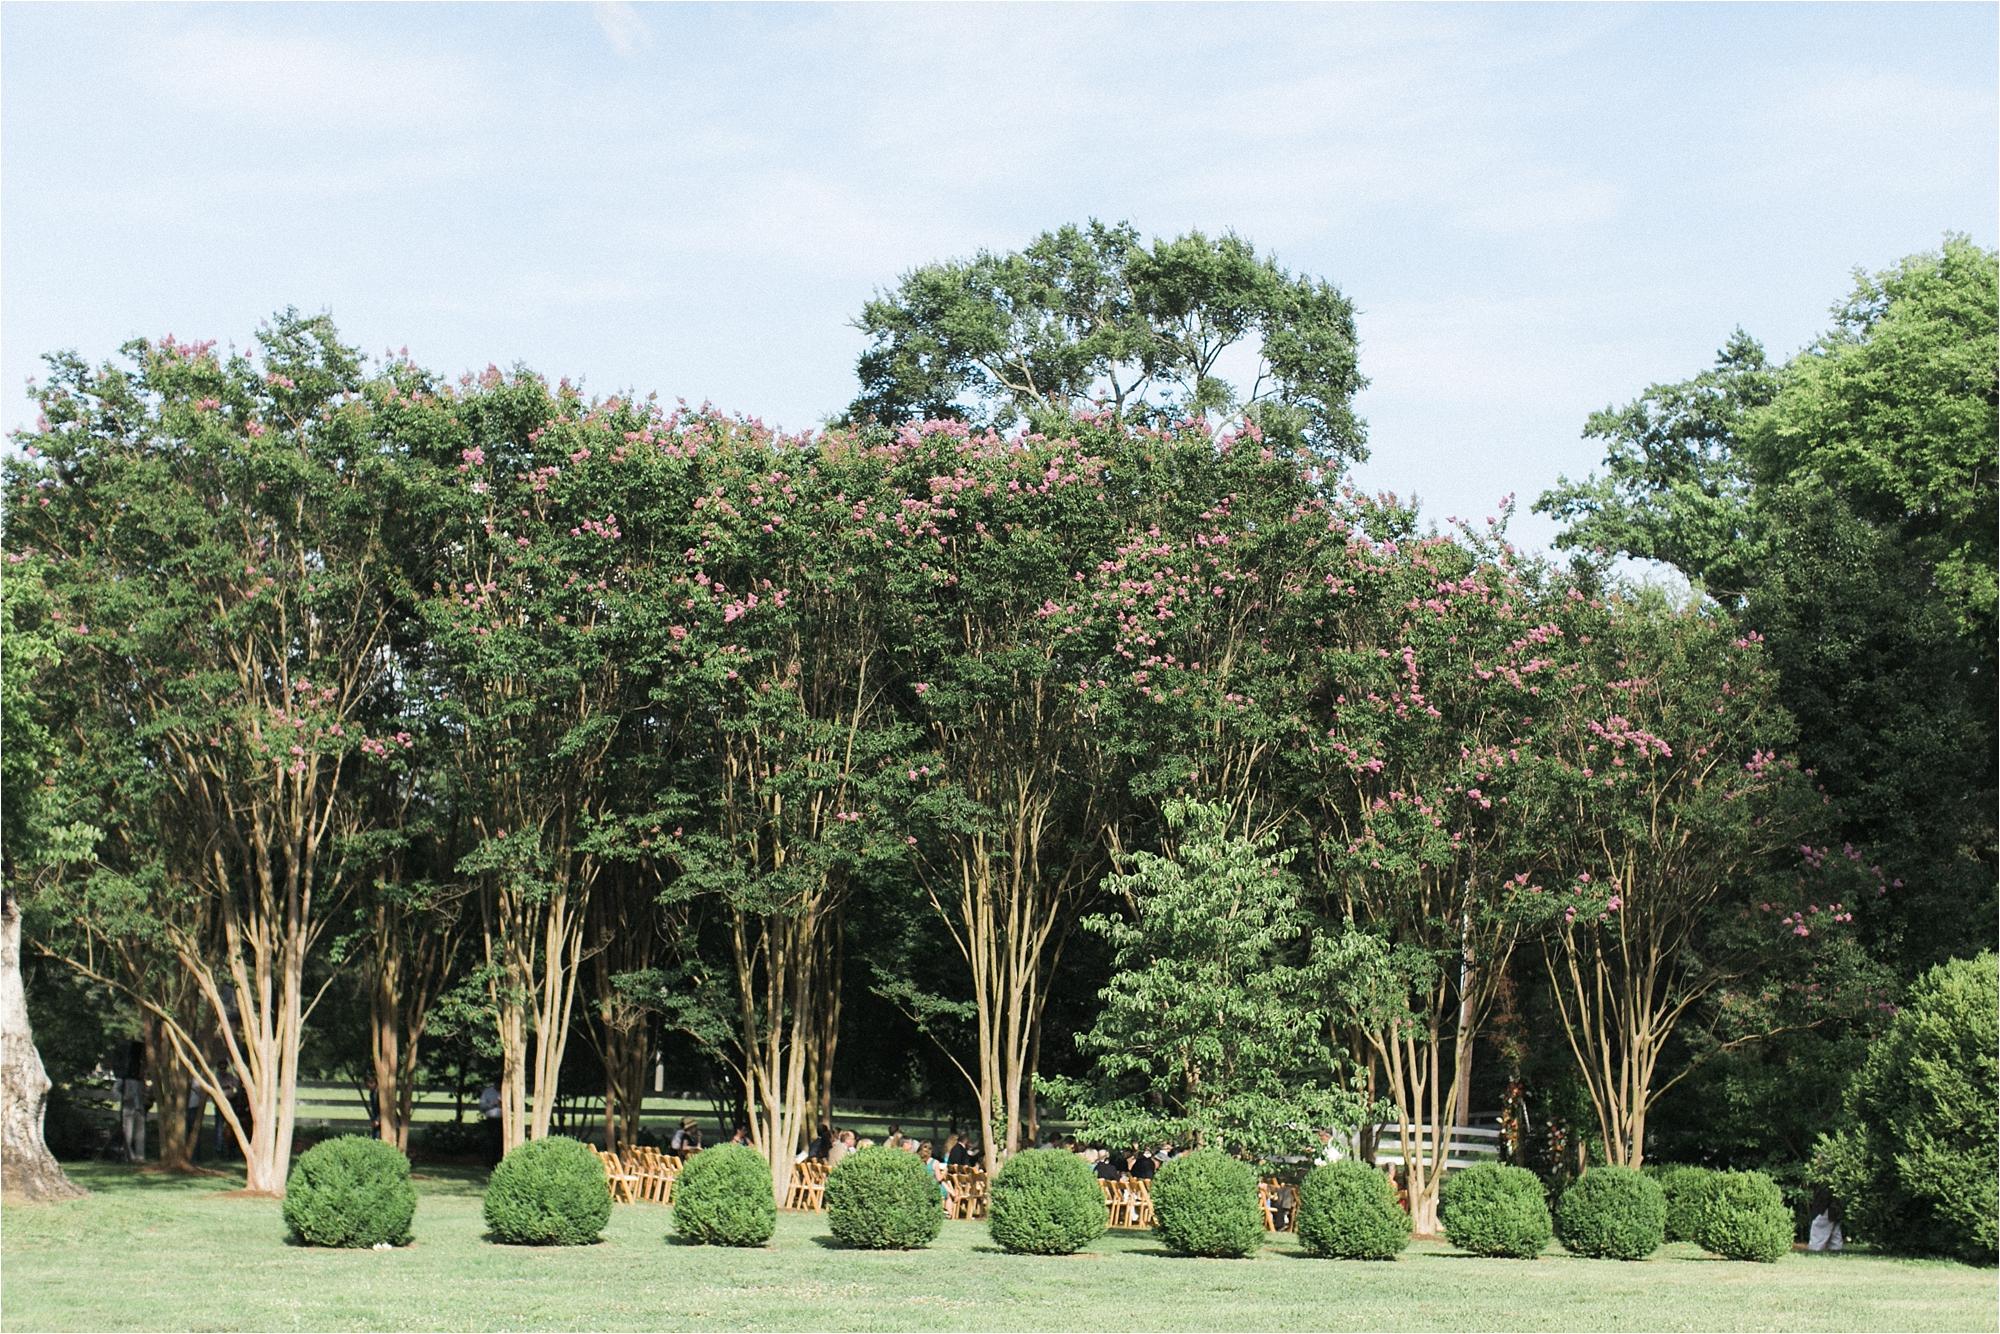 richmond-virginia-tuckahoe-plantation-coral-summer-wedding-stephanie-yonce-photos_0023.jpg